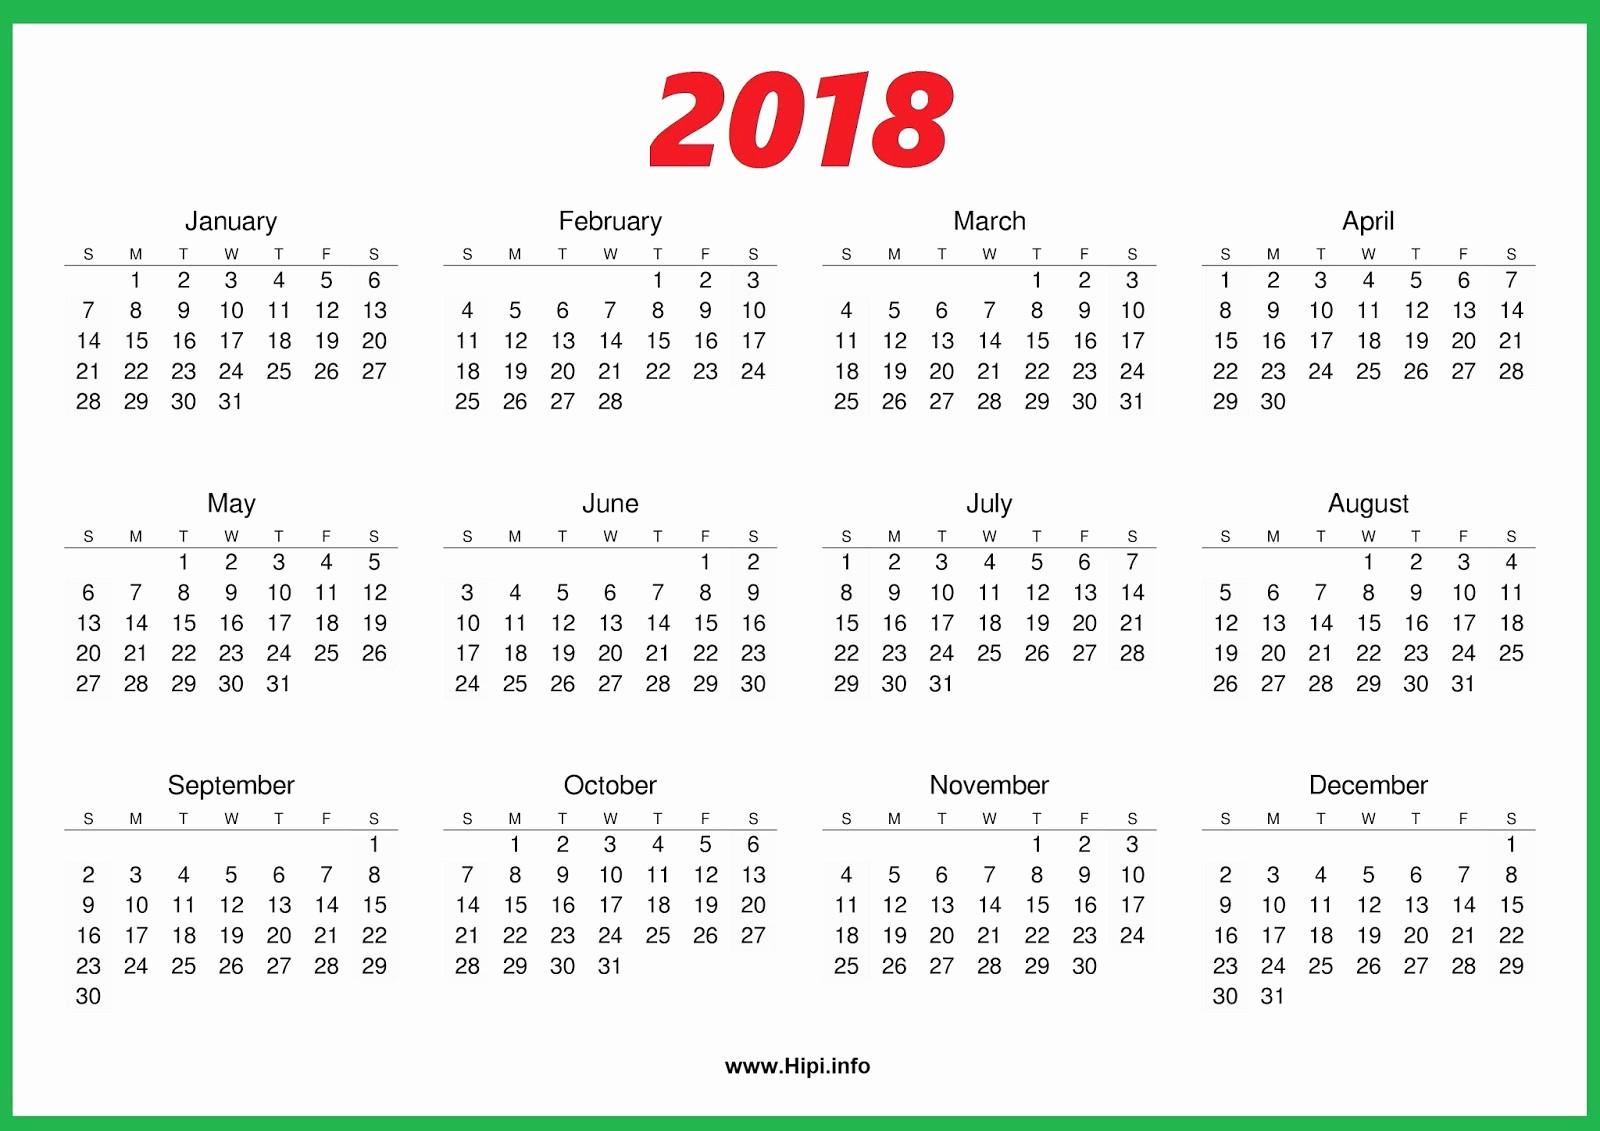 Free Printable 2018 Calendar Templates Luxury 2018 Calendar E Page